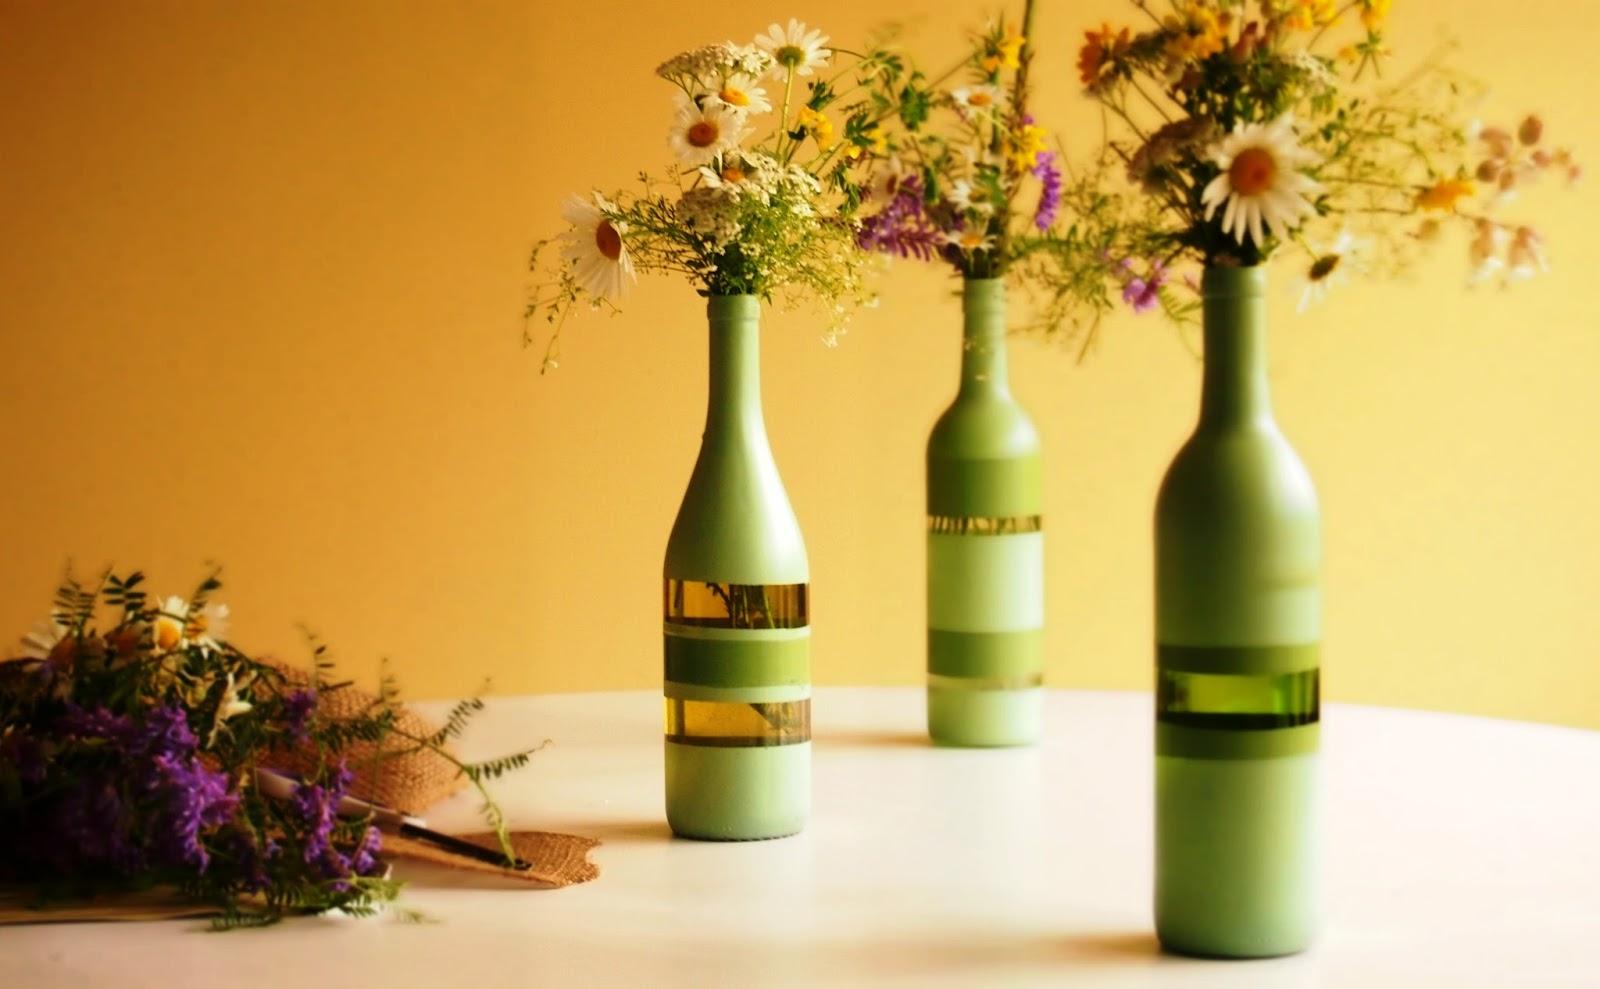 Wine bottle recycle craft project art craft projects - Botellas de vino decoradas ...